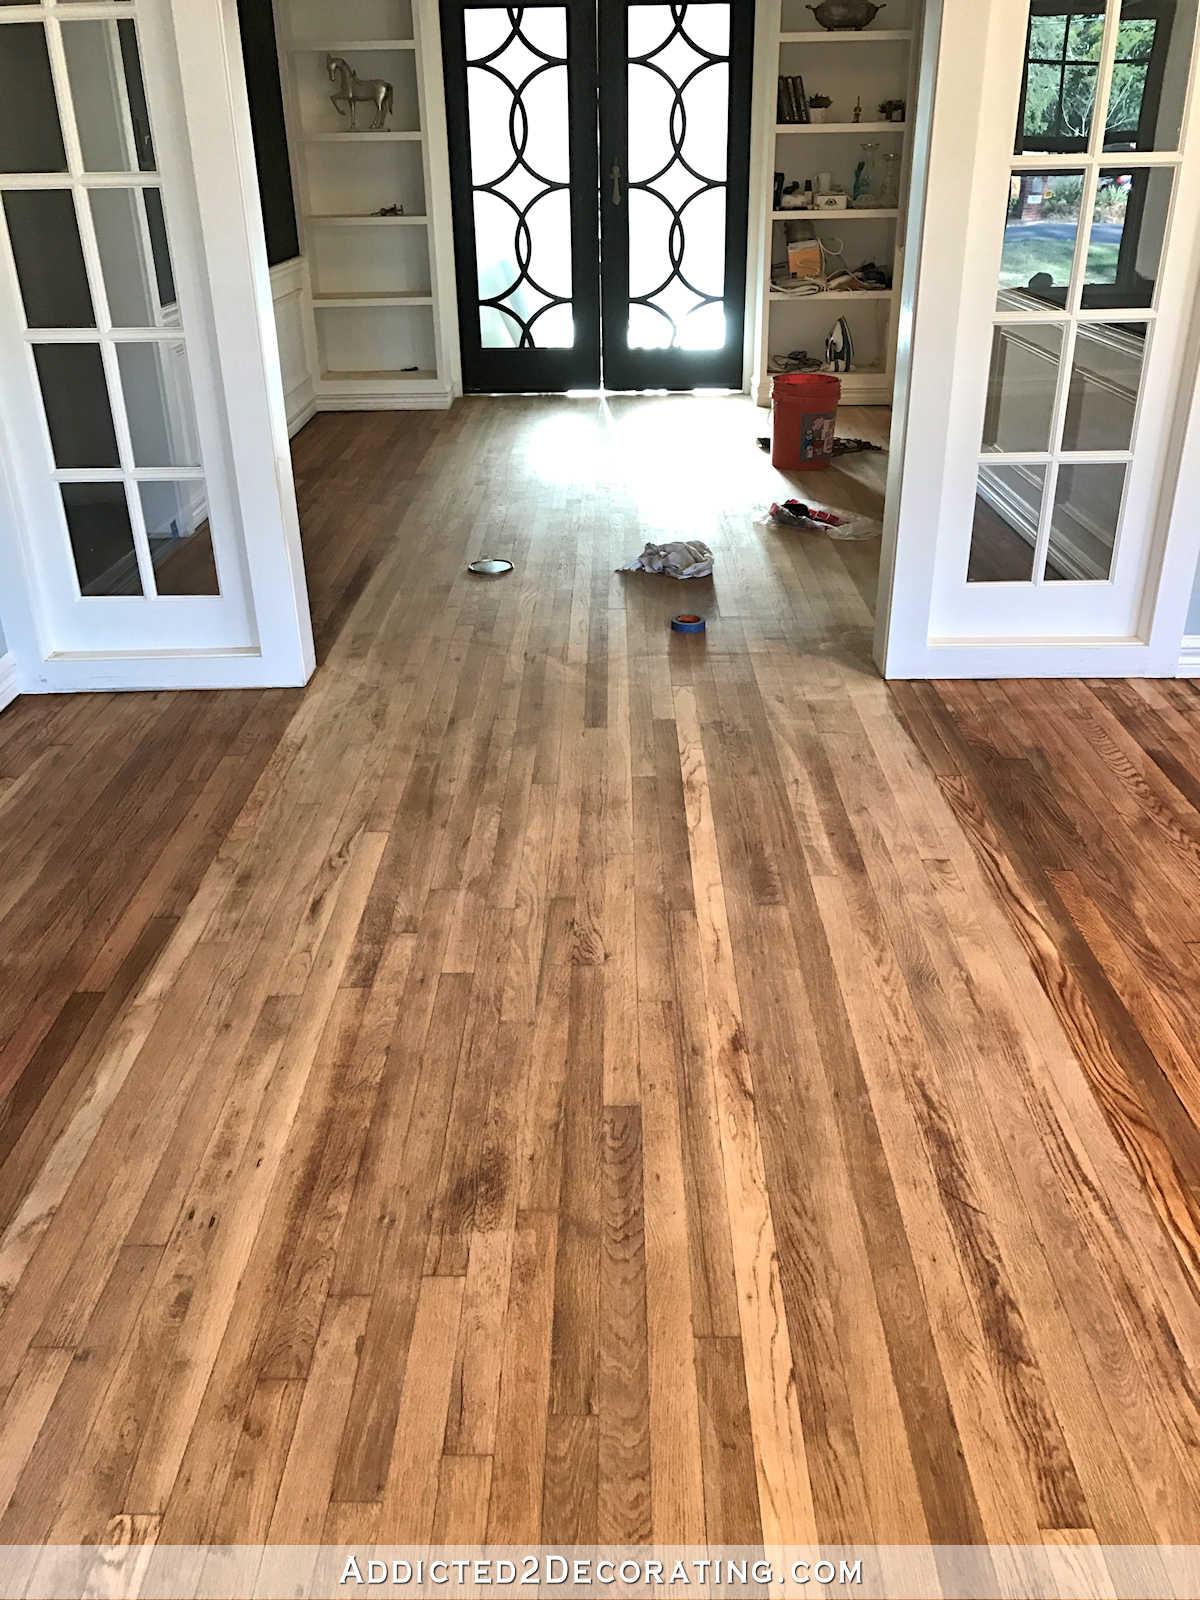 are dark or light hardwood floors better of adventures in staining my red oak hardwood floors products process pertaining to staining red oak hardwood floors 5 music room wood conditioner